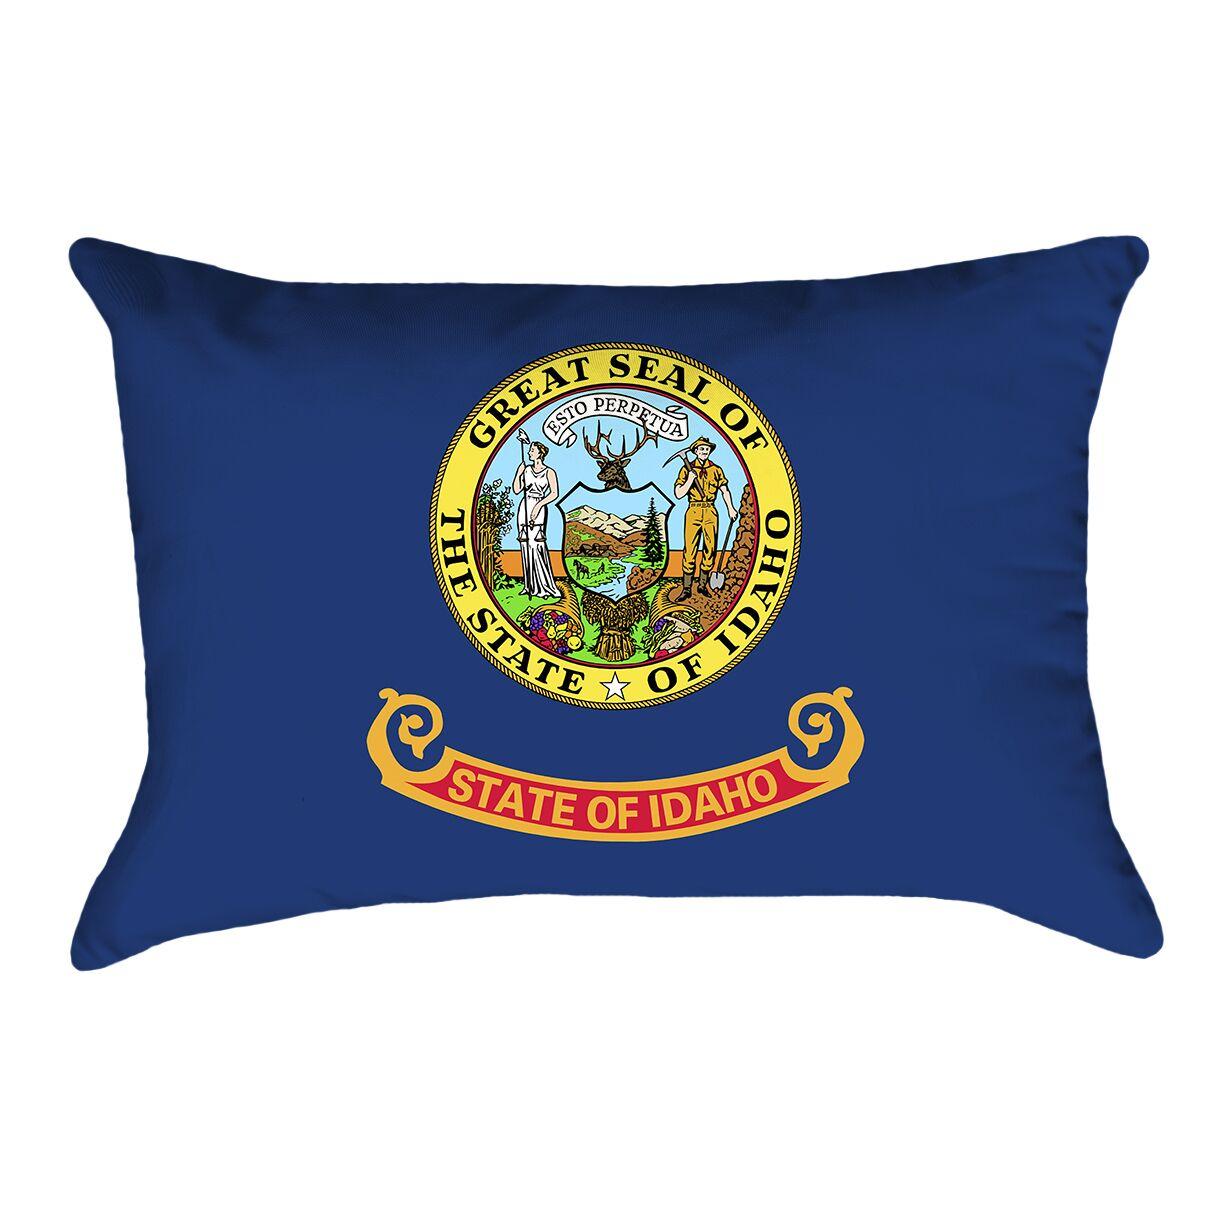 Centers Idaho Flag Lumbar Pillow Material/Product Type: Cotton Twill Double Sided Print/Lumbar Pillow